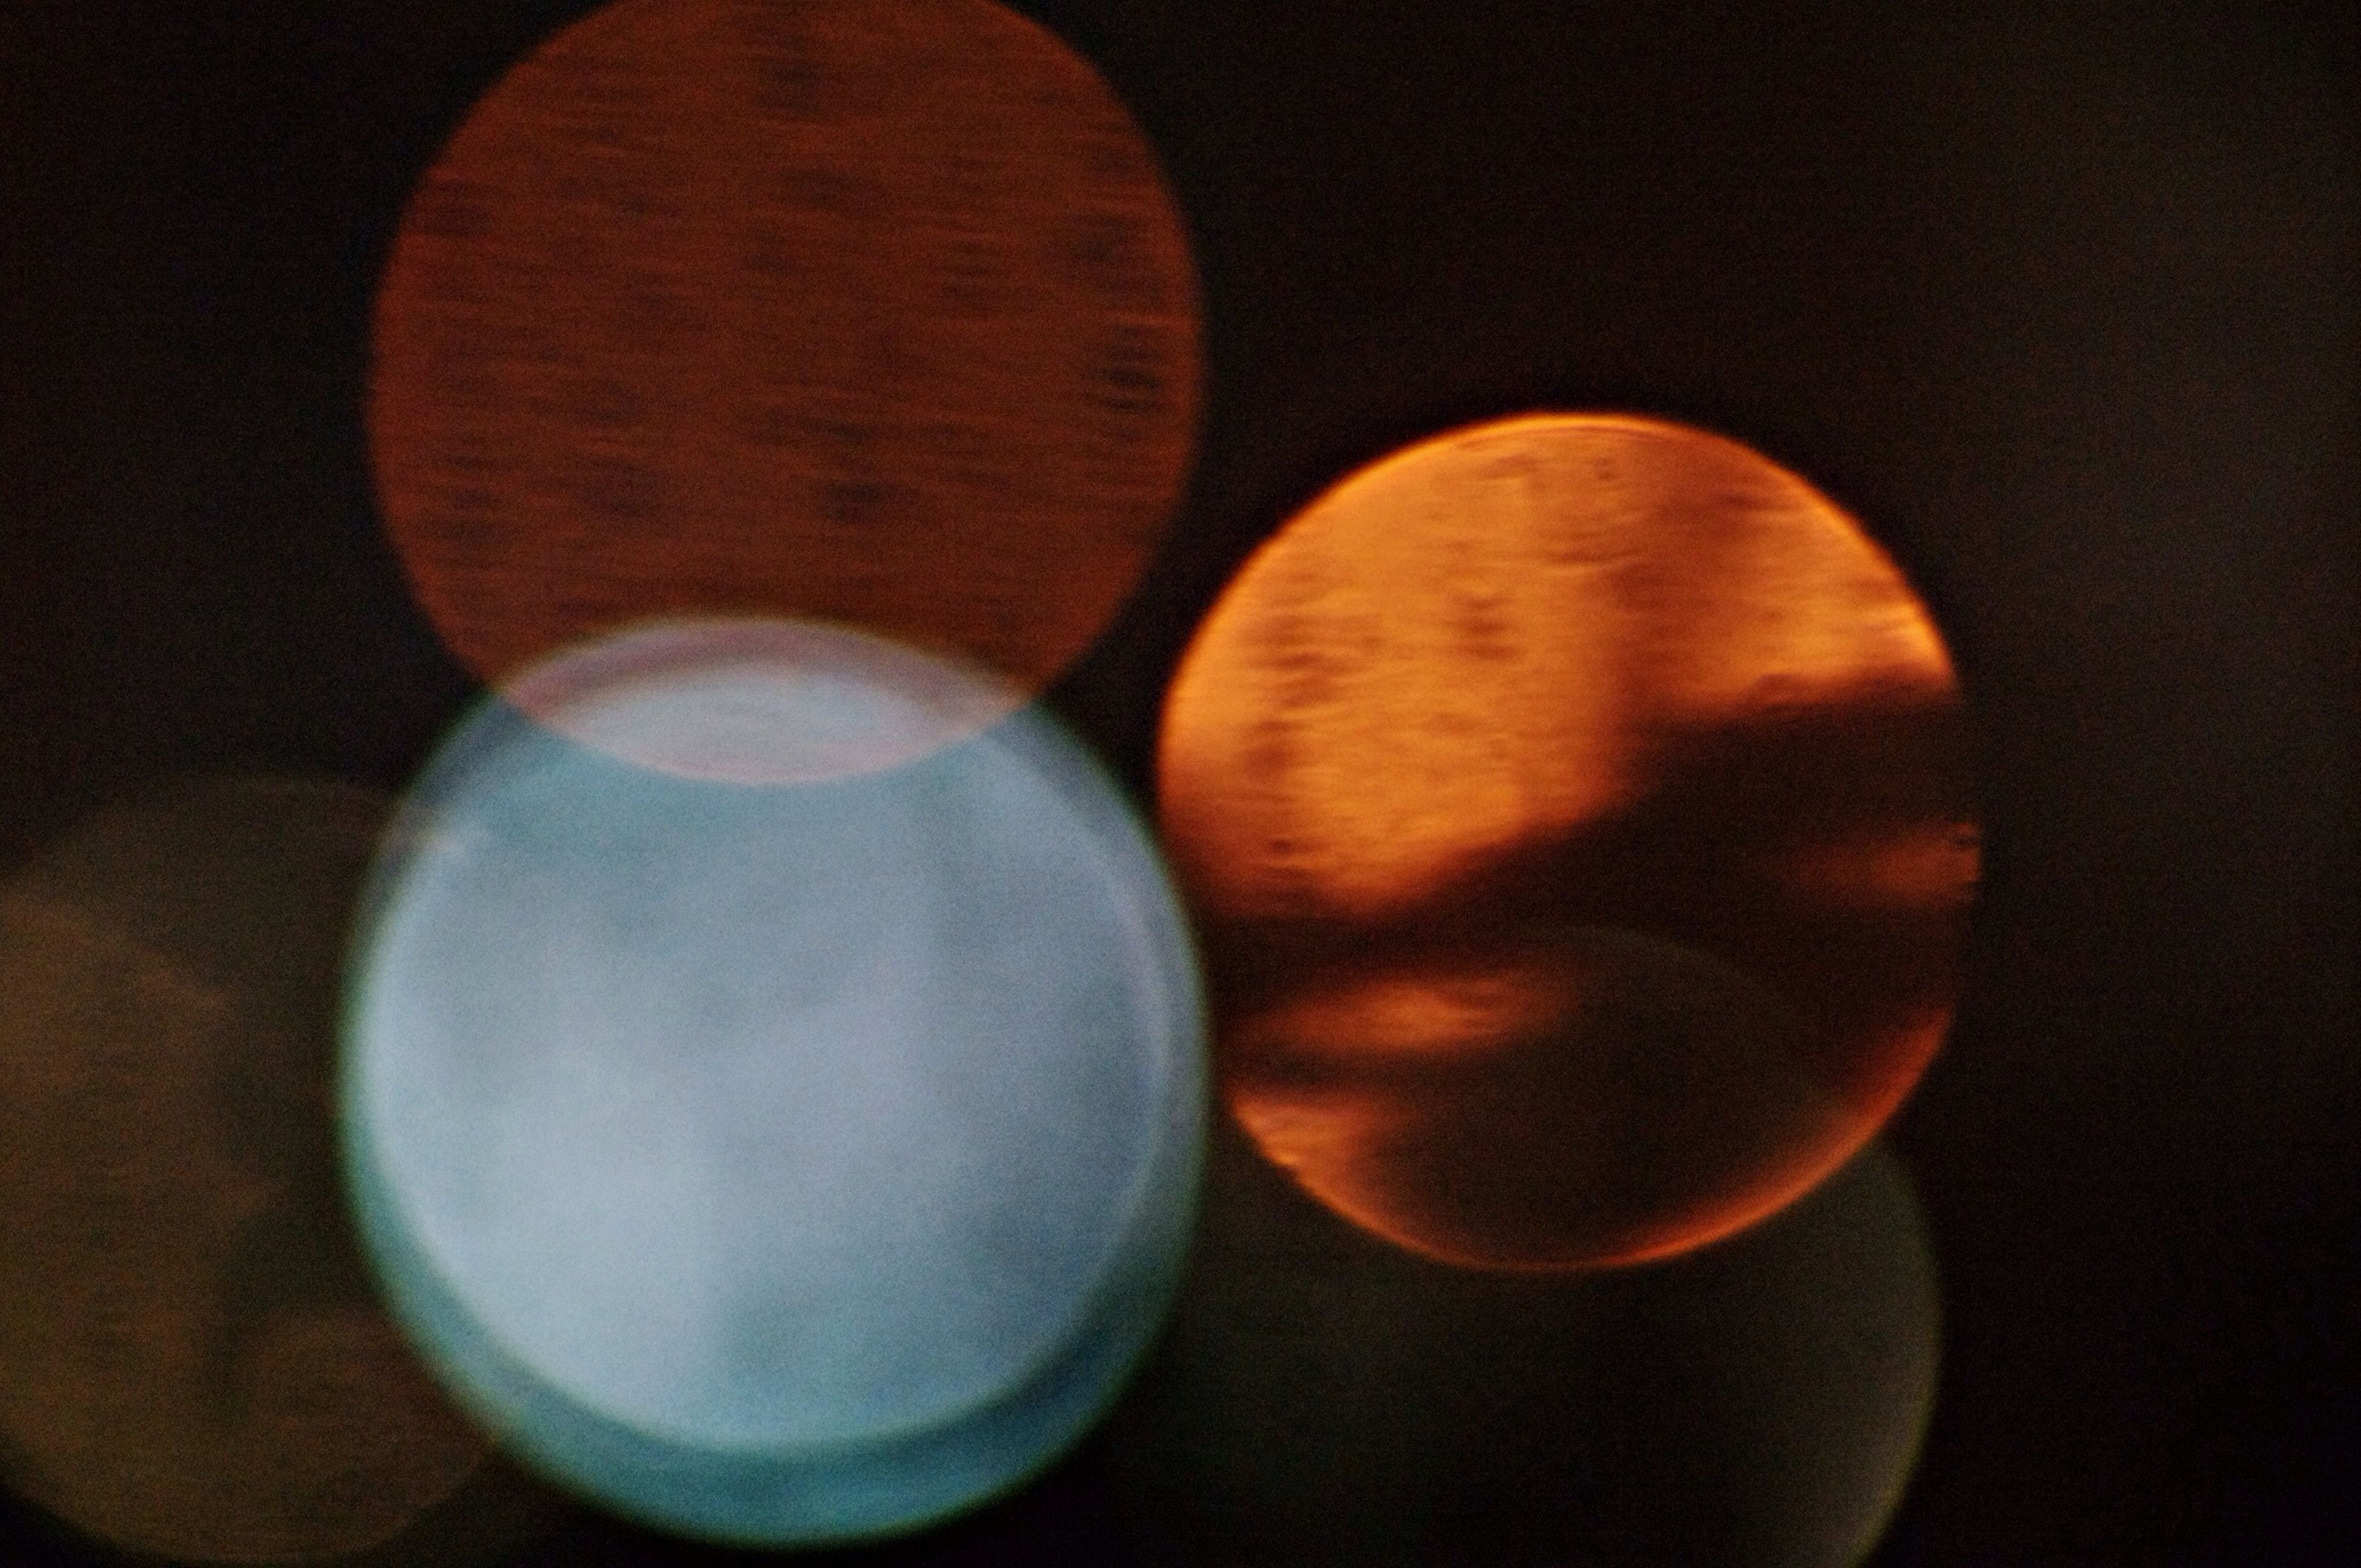 circle, indoors, close-up, still life, illuminated, night, geometric shape, sphere, no people, orange color, shape, dark, table, round, lighting equipment, high angle view, pattern, light - natural phenomenon, glowing, studio shot